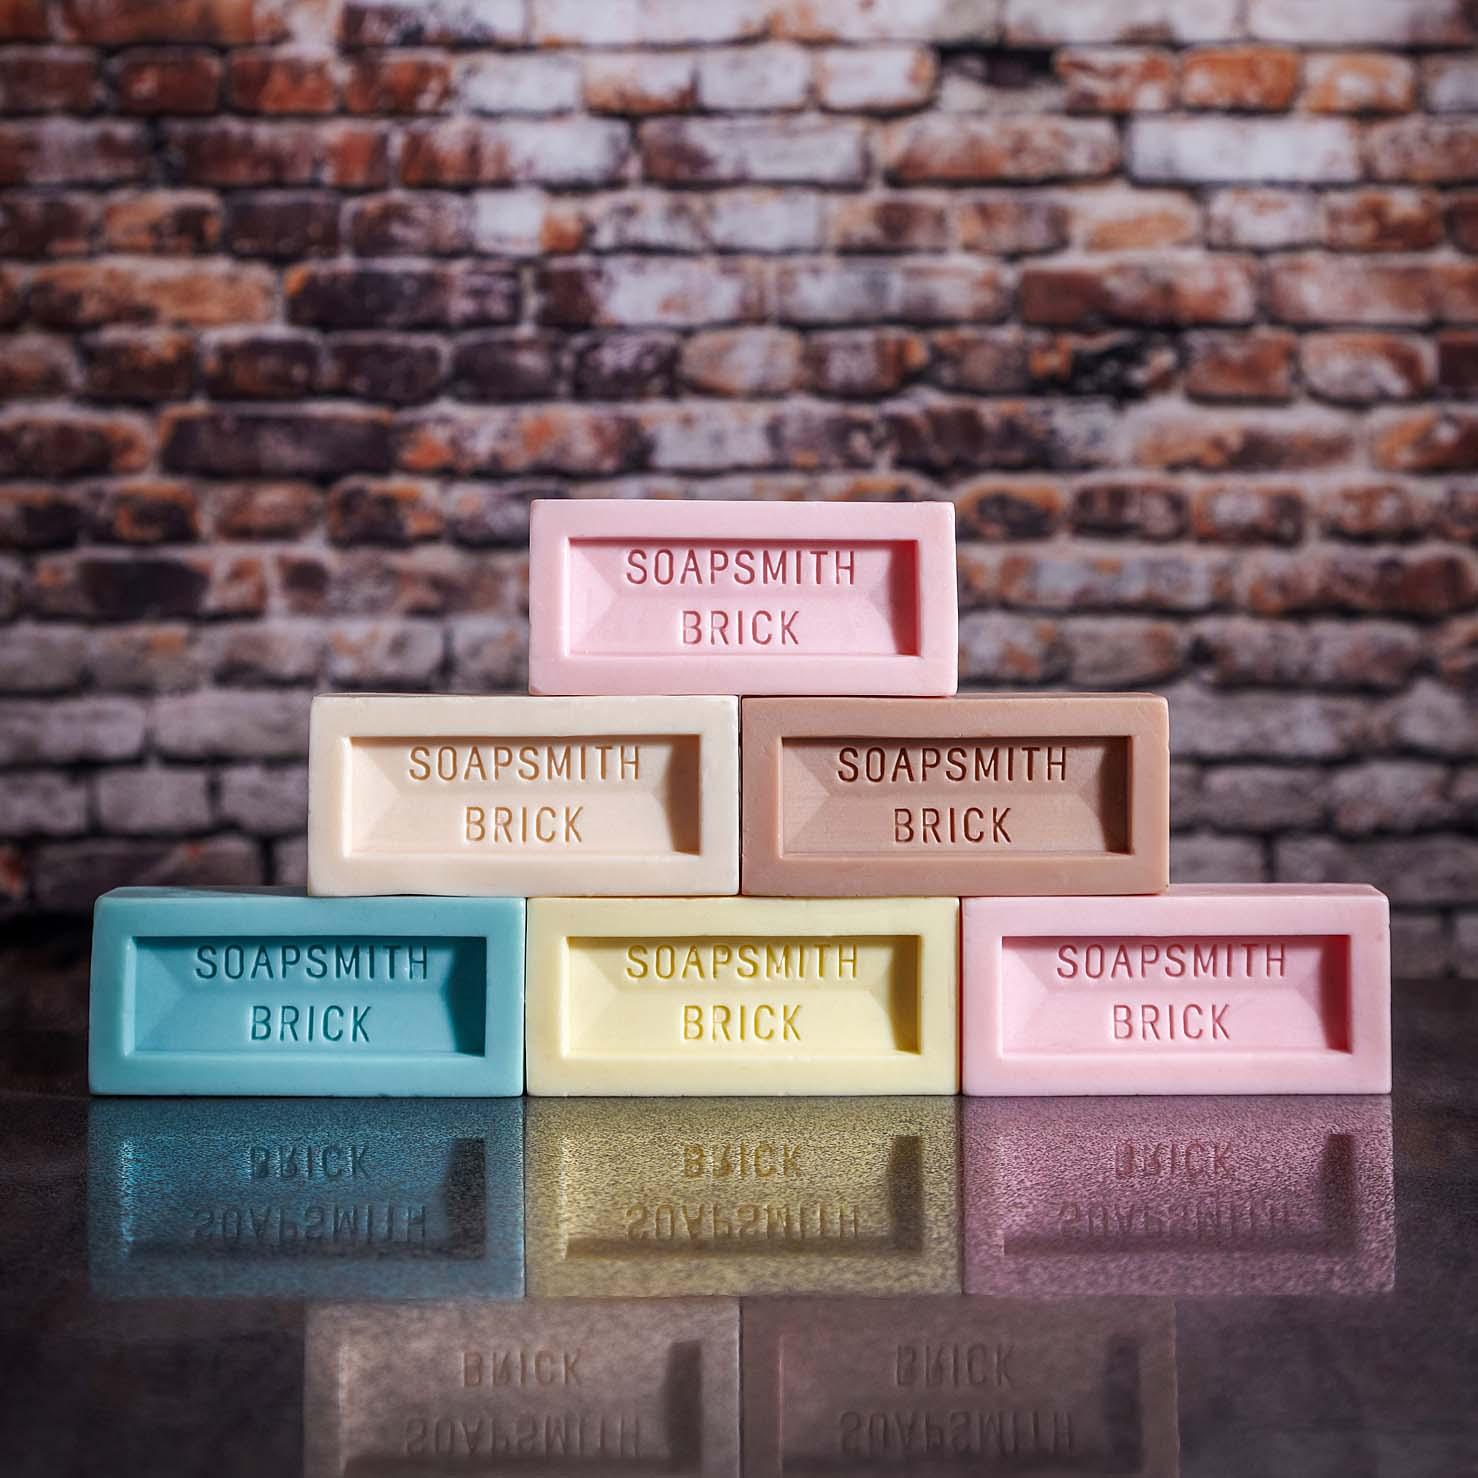 soapsmith bricks.jpg